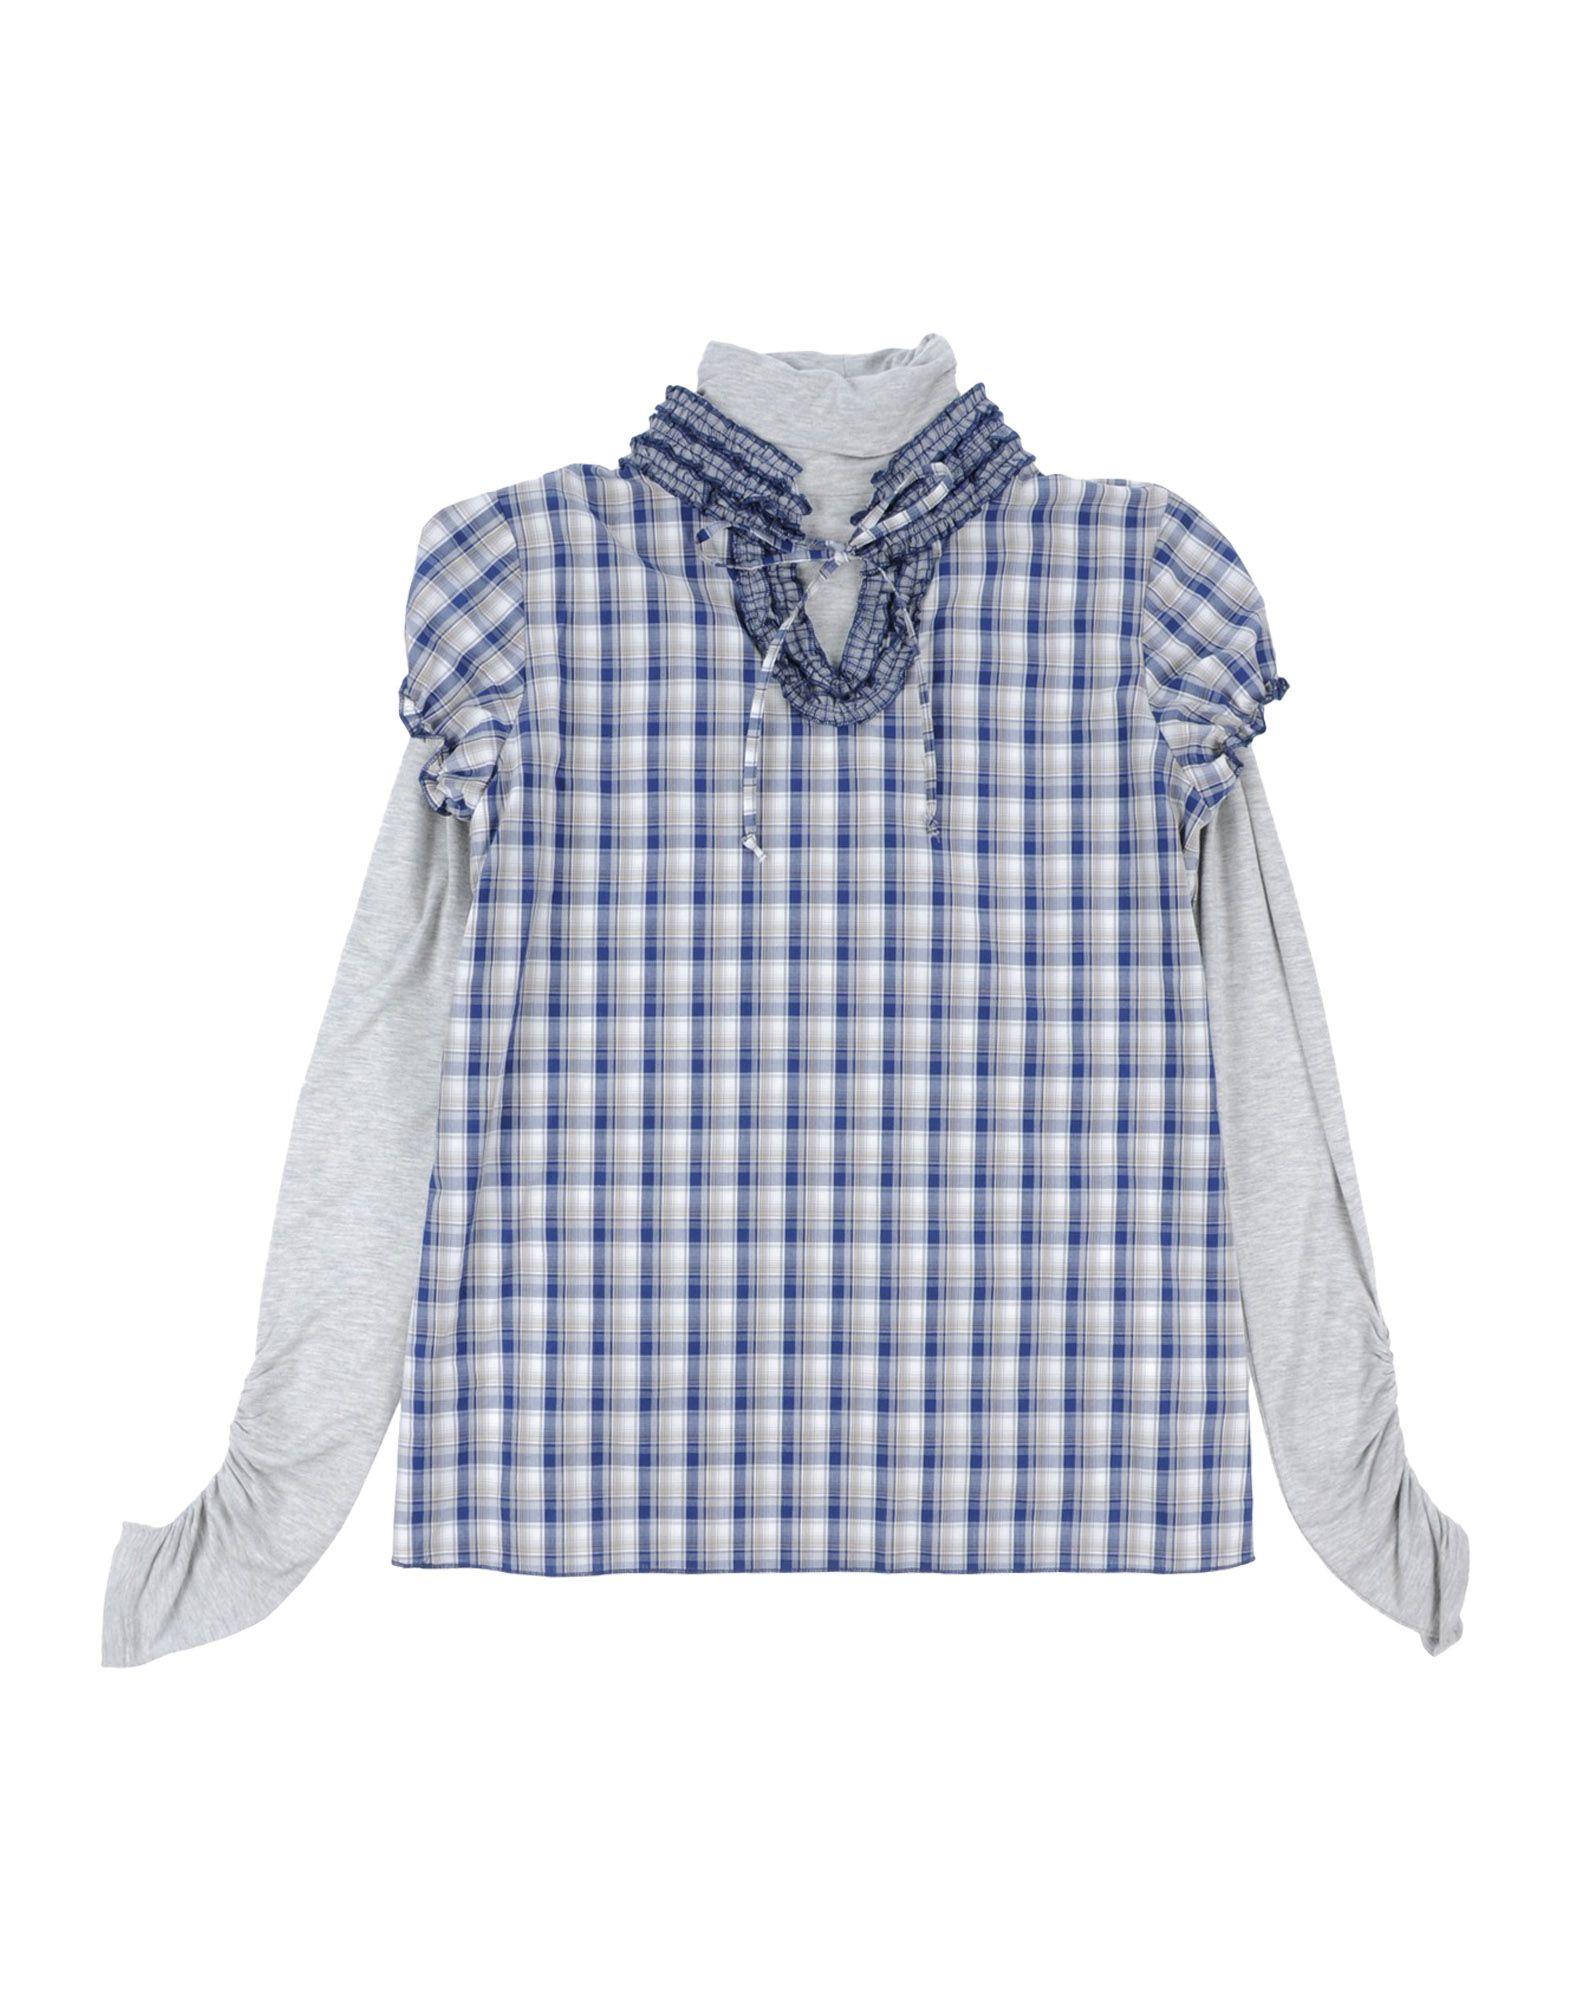 PATRIZIA PEPE Блузка комплект 2 части блузка топ quelle patrizia dini by heine 83403